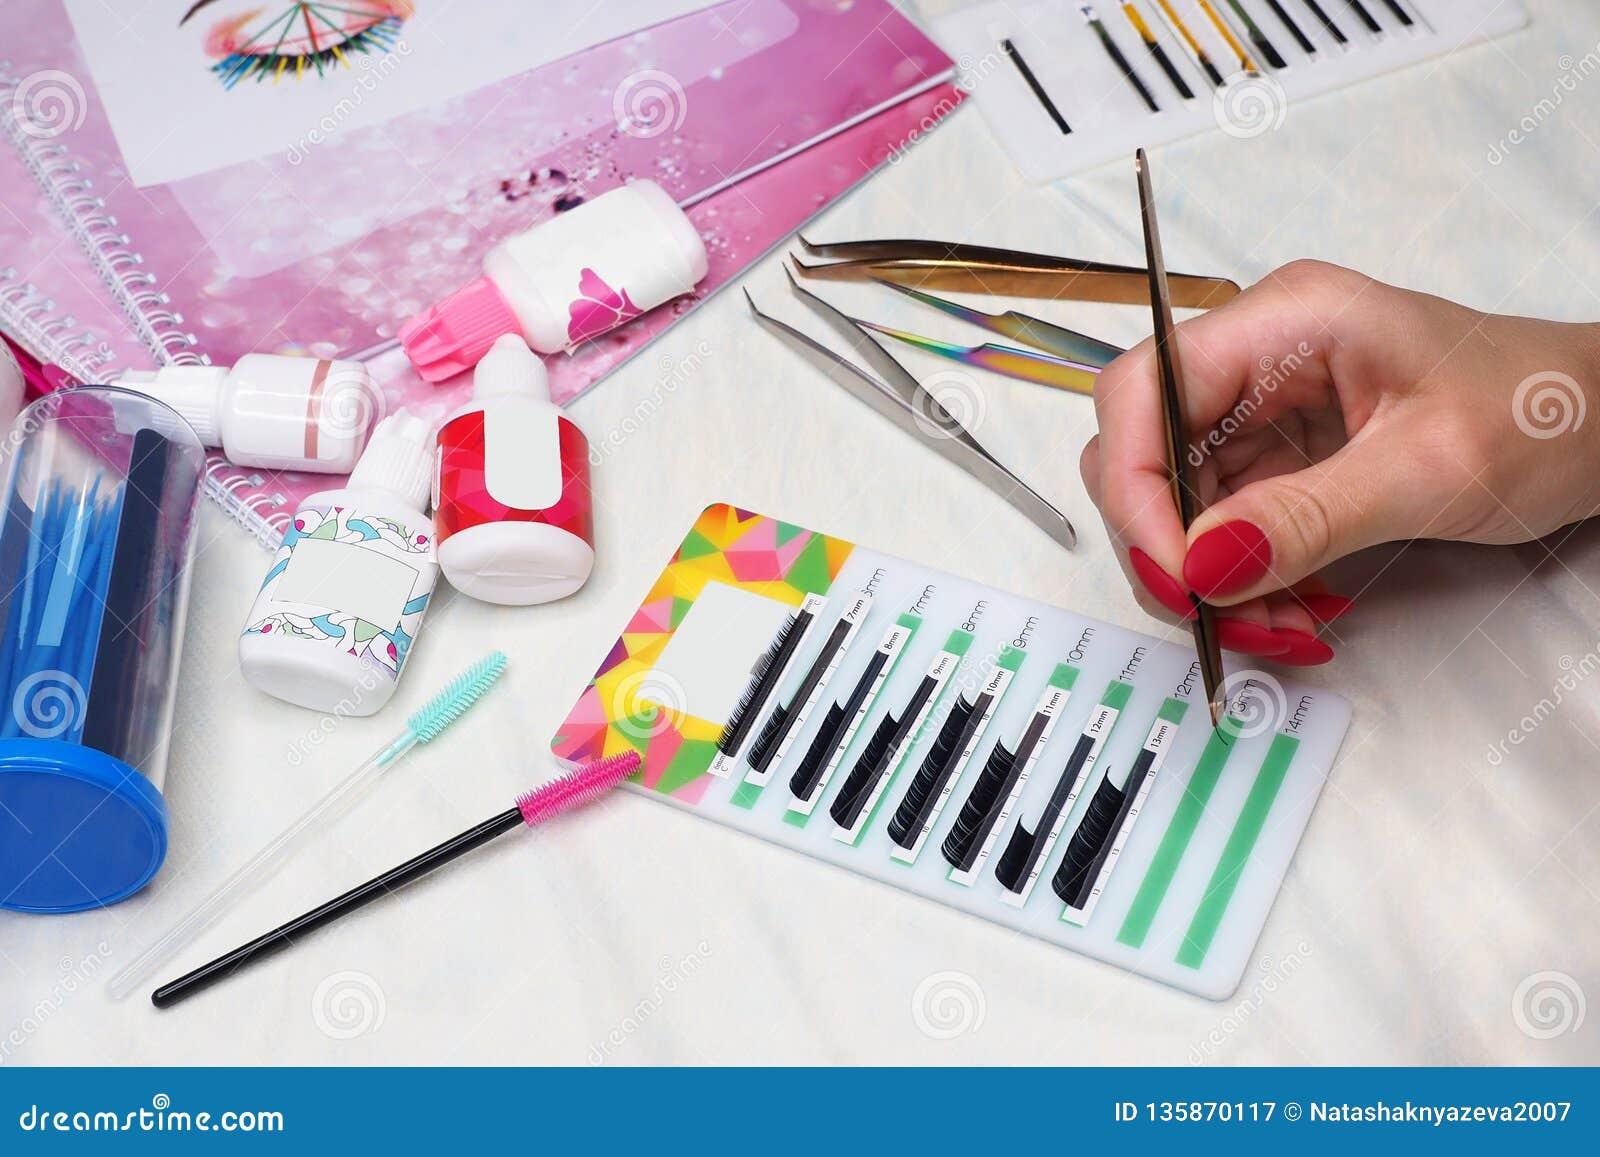 Equipment of eyelash extension, basic training and practice